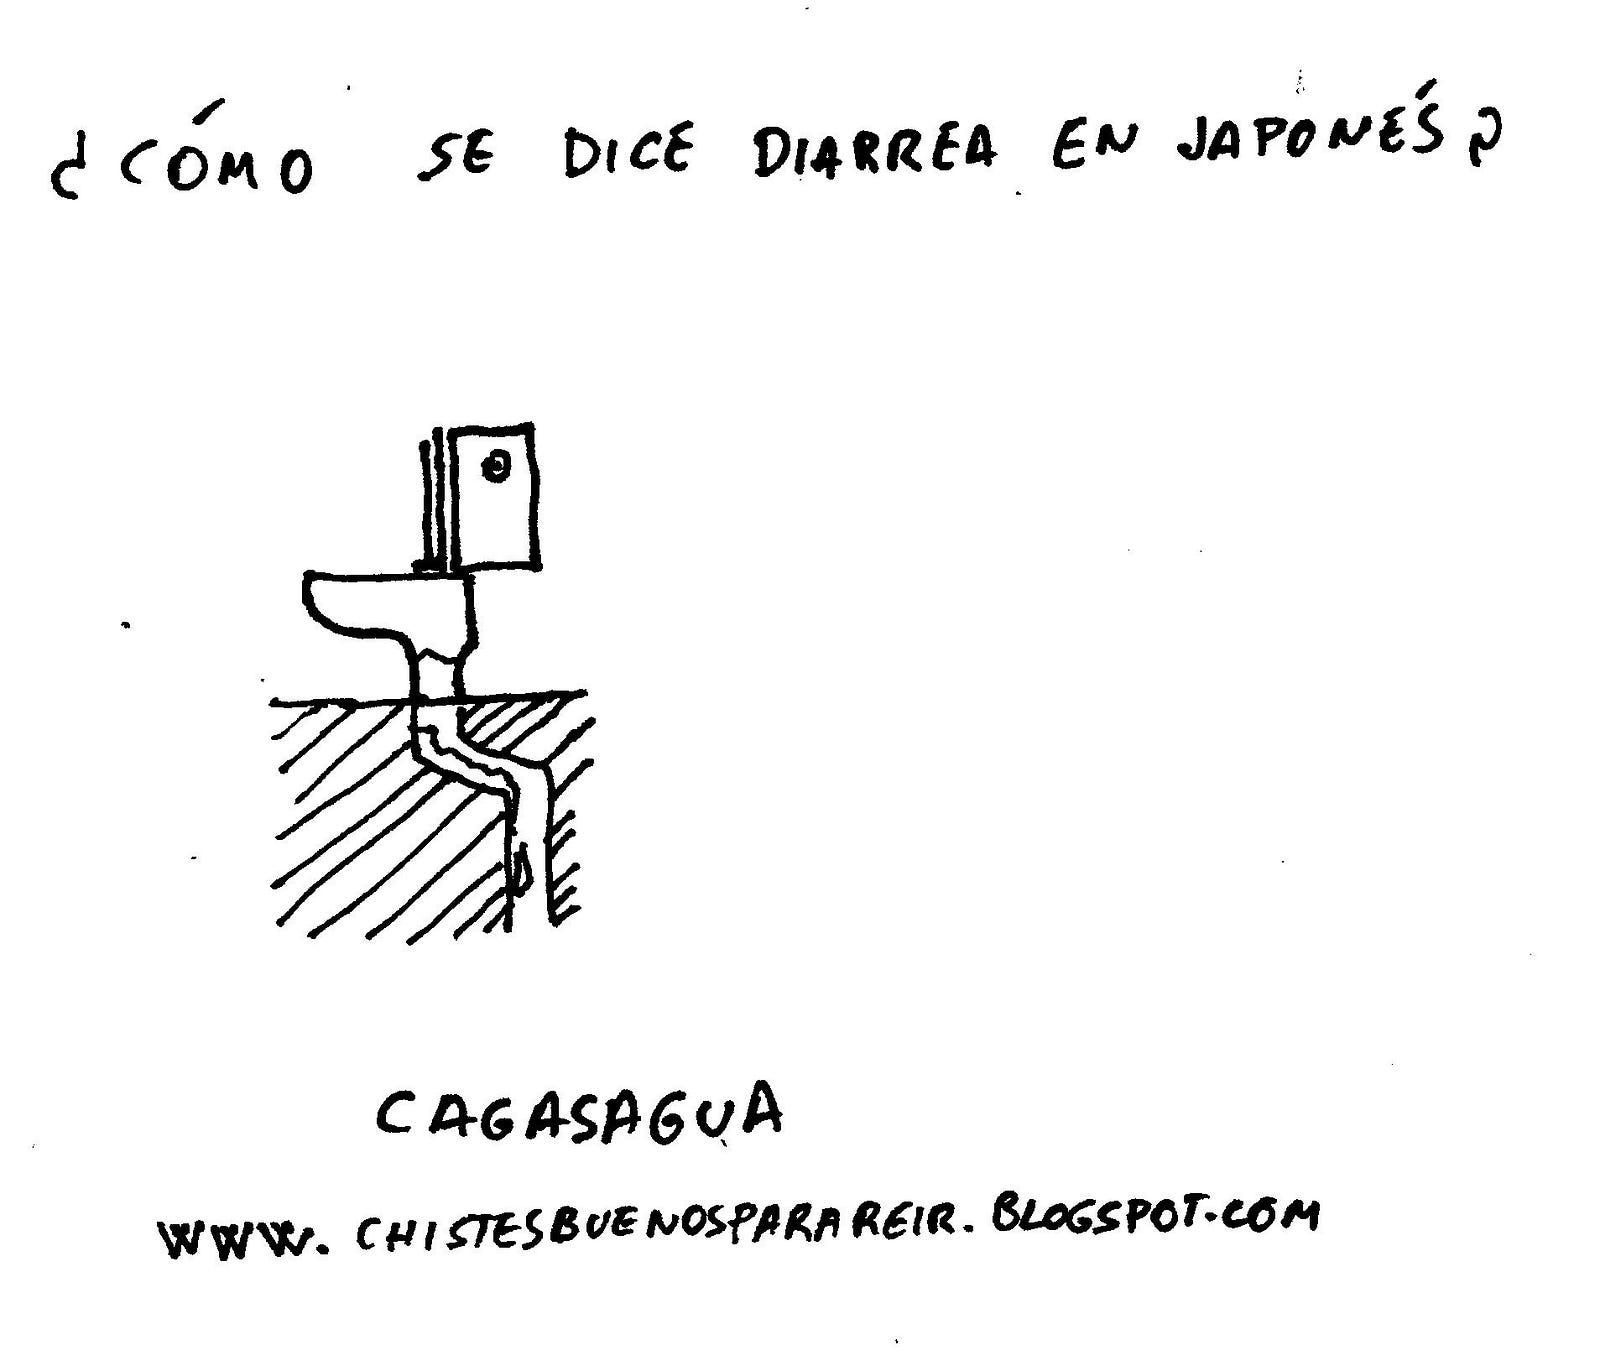 Chiste de cmo se dice diarrea en japons  Carlos